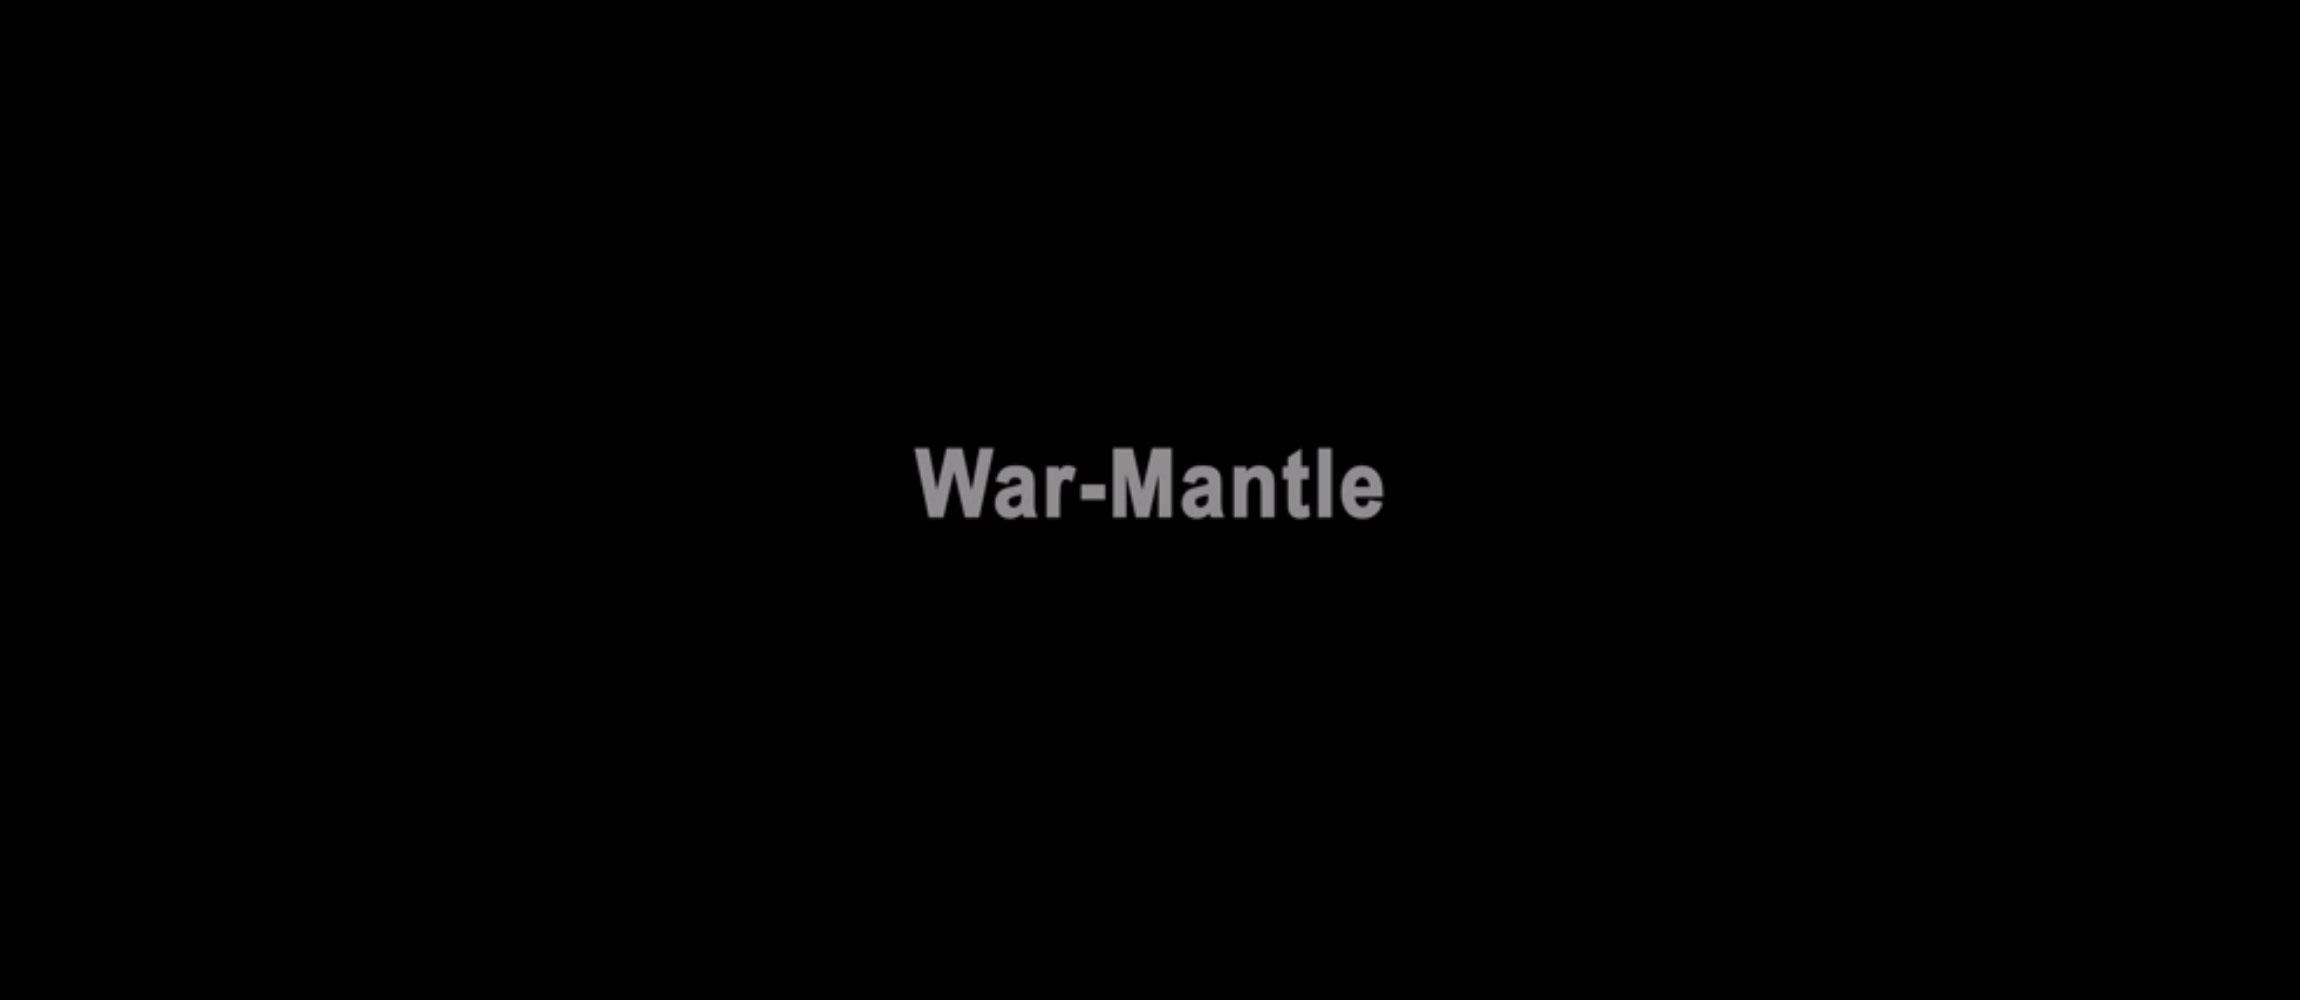 War-Mantle title card